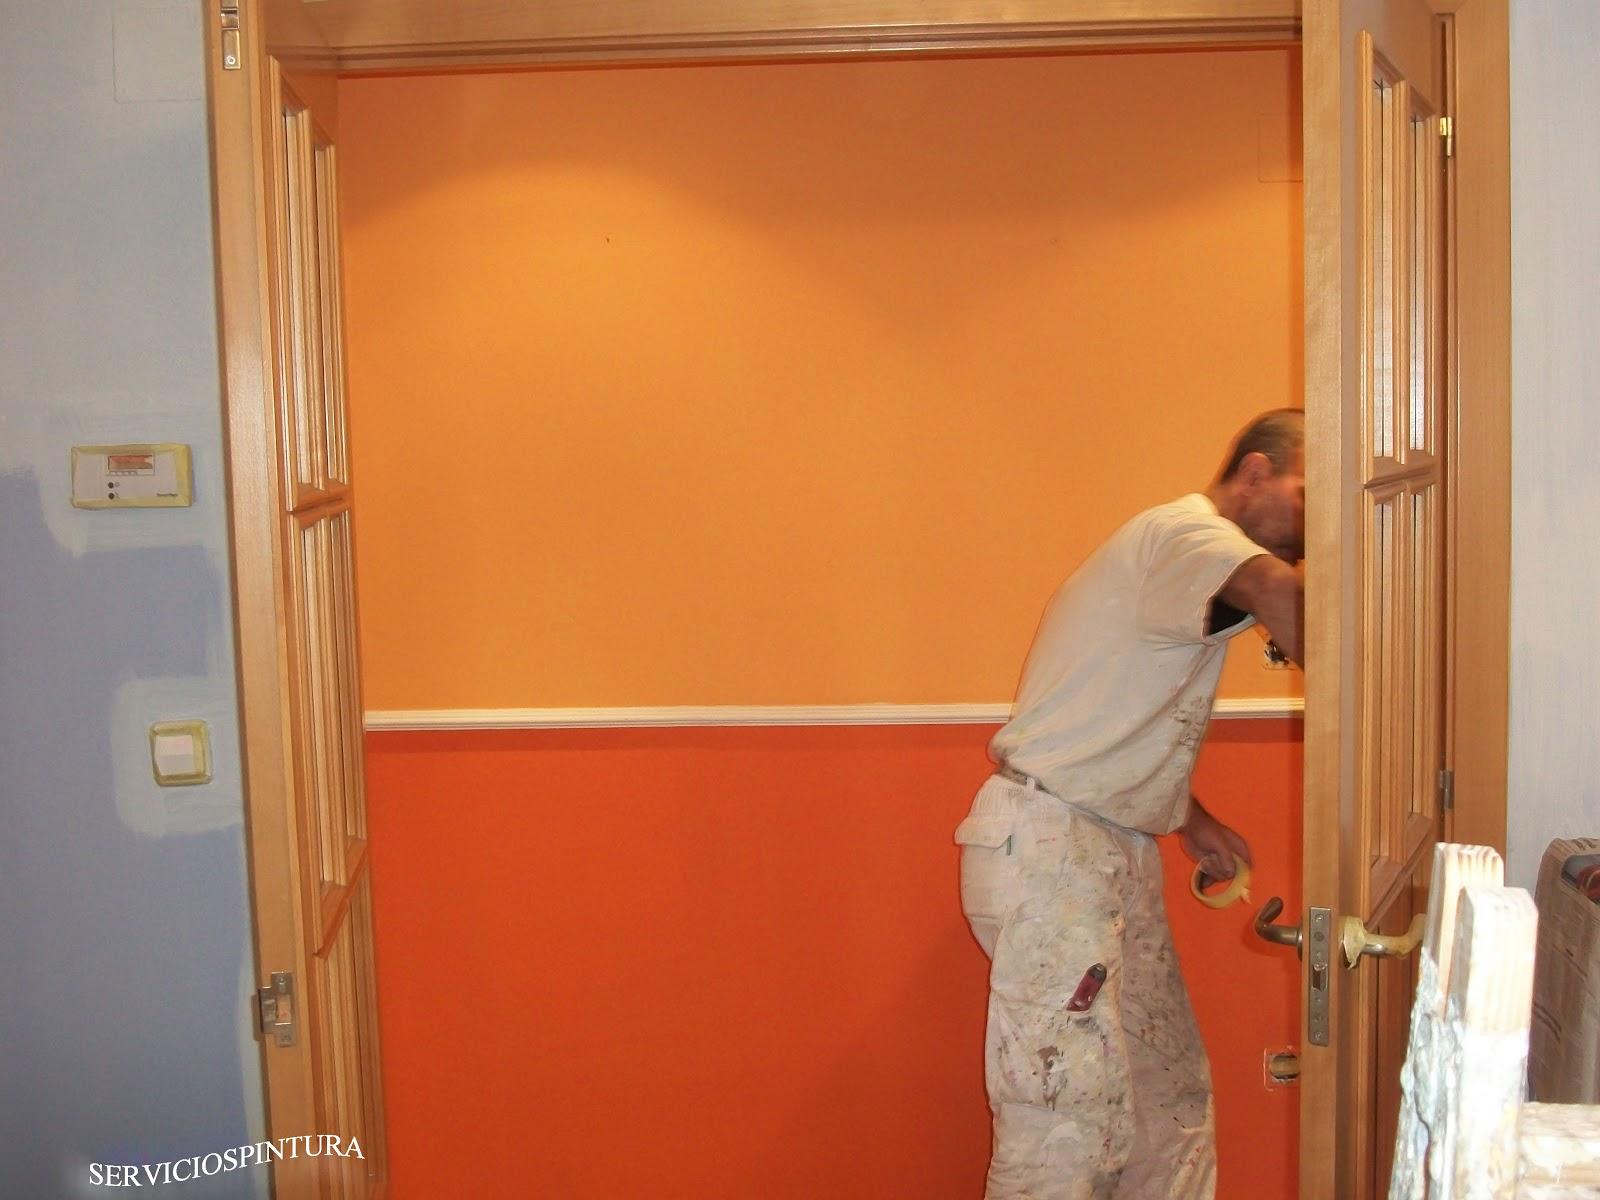 Servicios de pintura en zaragoza - Como pintar el pasillo ...